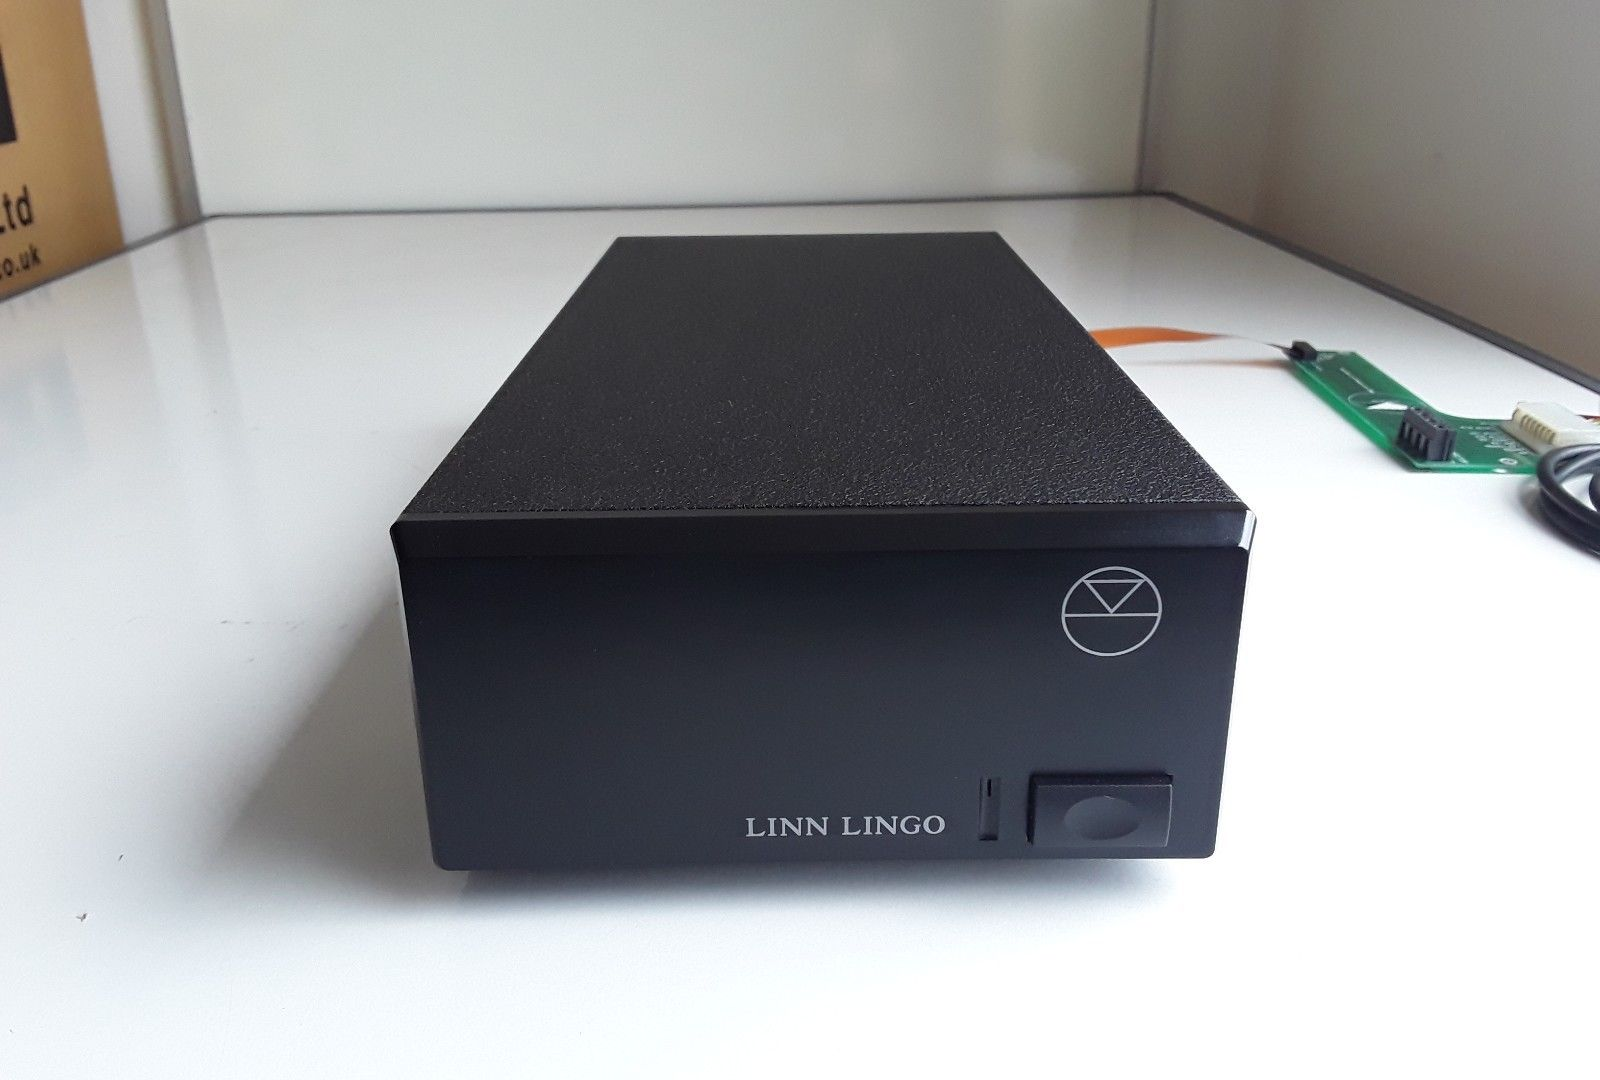 LINN LINGO #122 ราคา 36,000.- โทร. 084 560 3199 Line: audiodirect